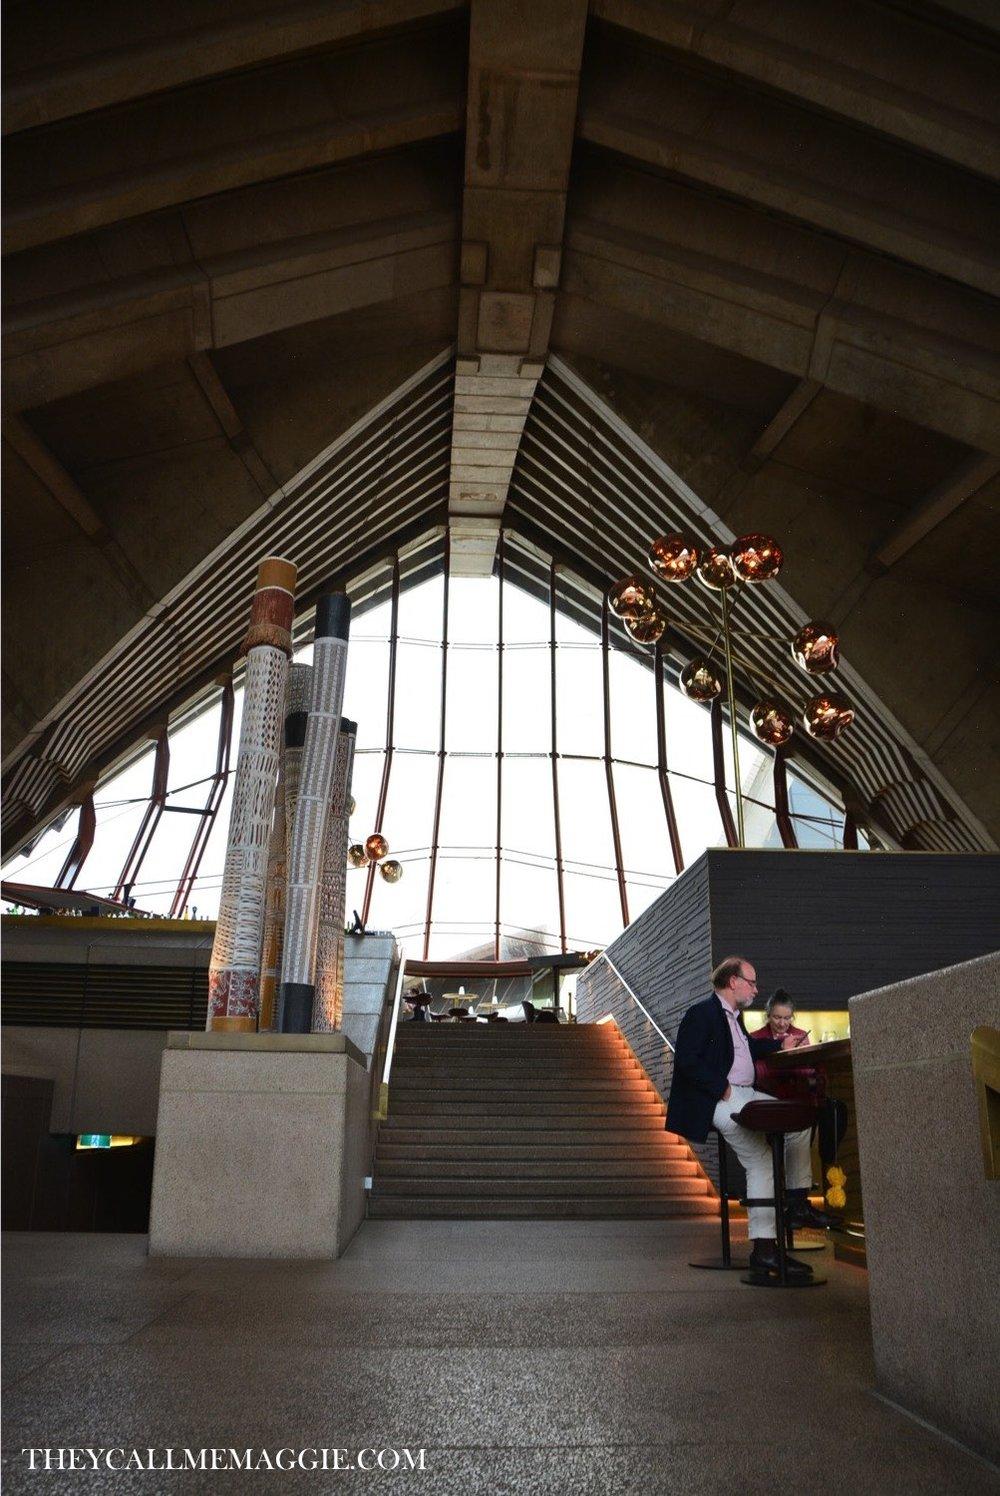 sydney-opera-house-interior.jpg